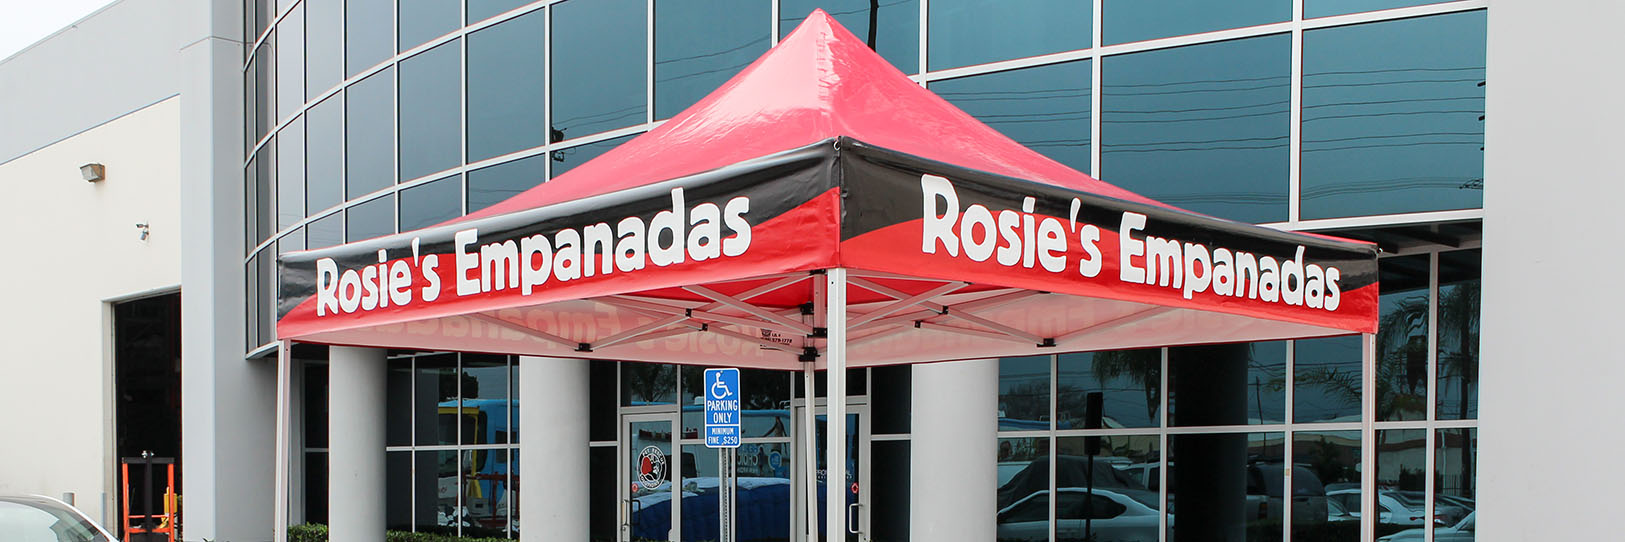 rosies-empanadas-header.jpg